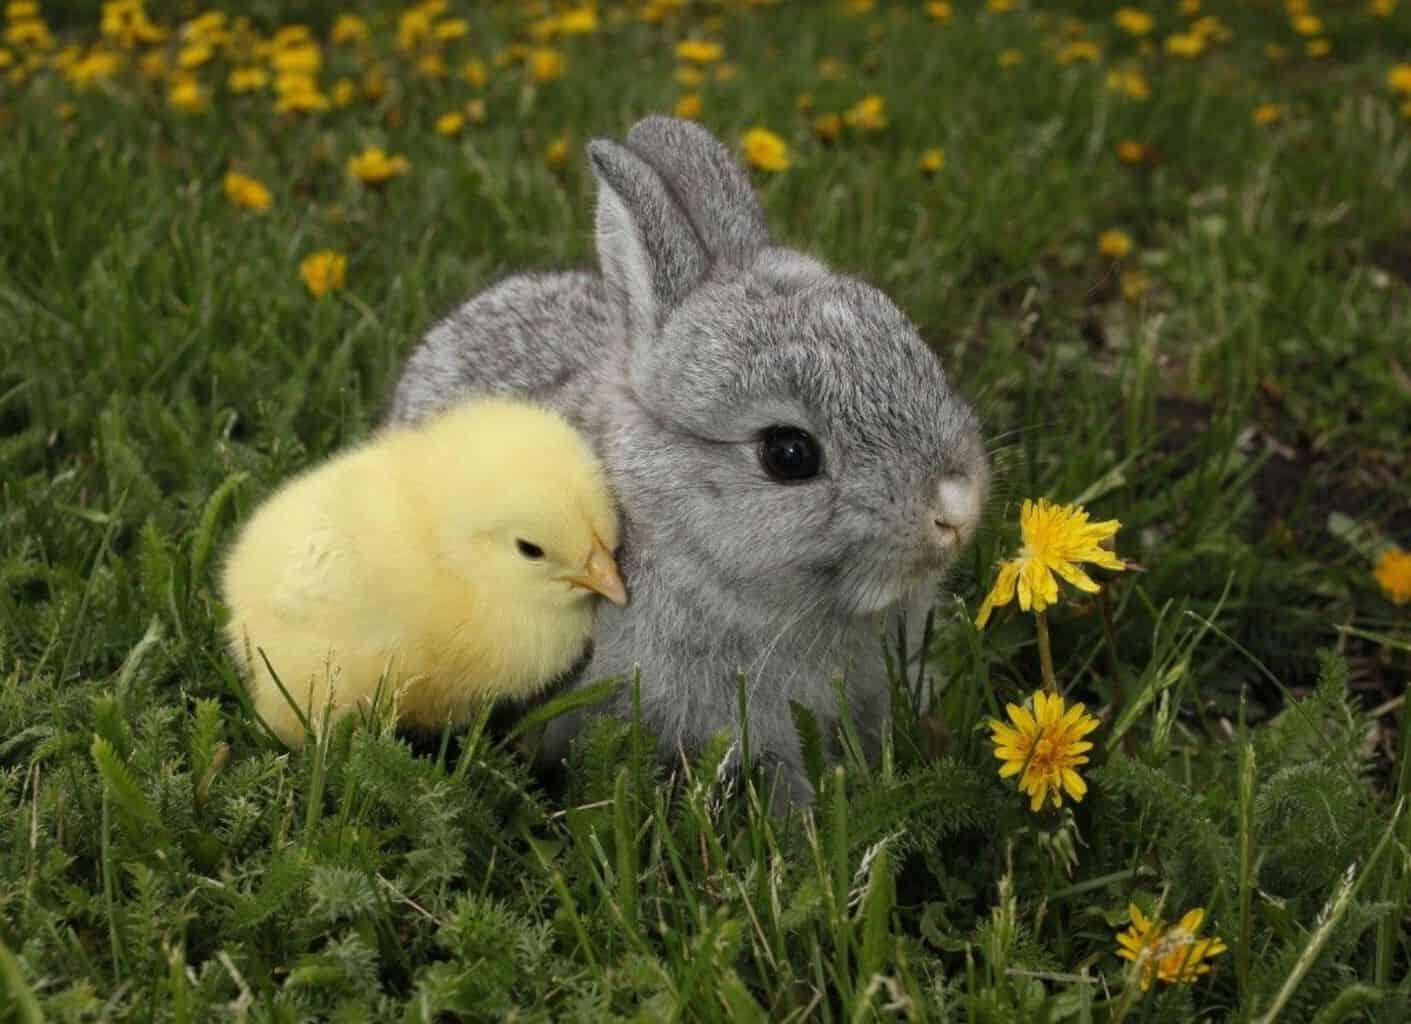 baby animals, cute animals